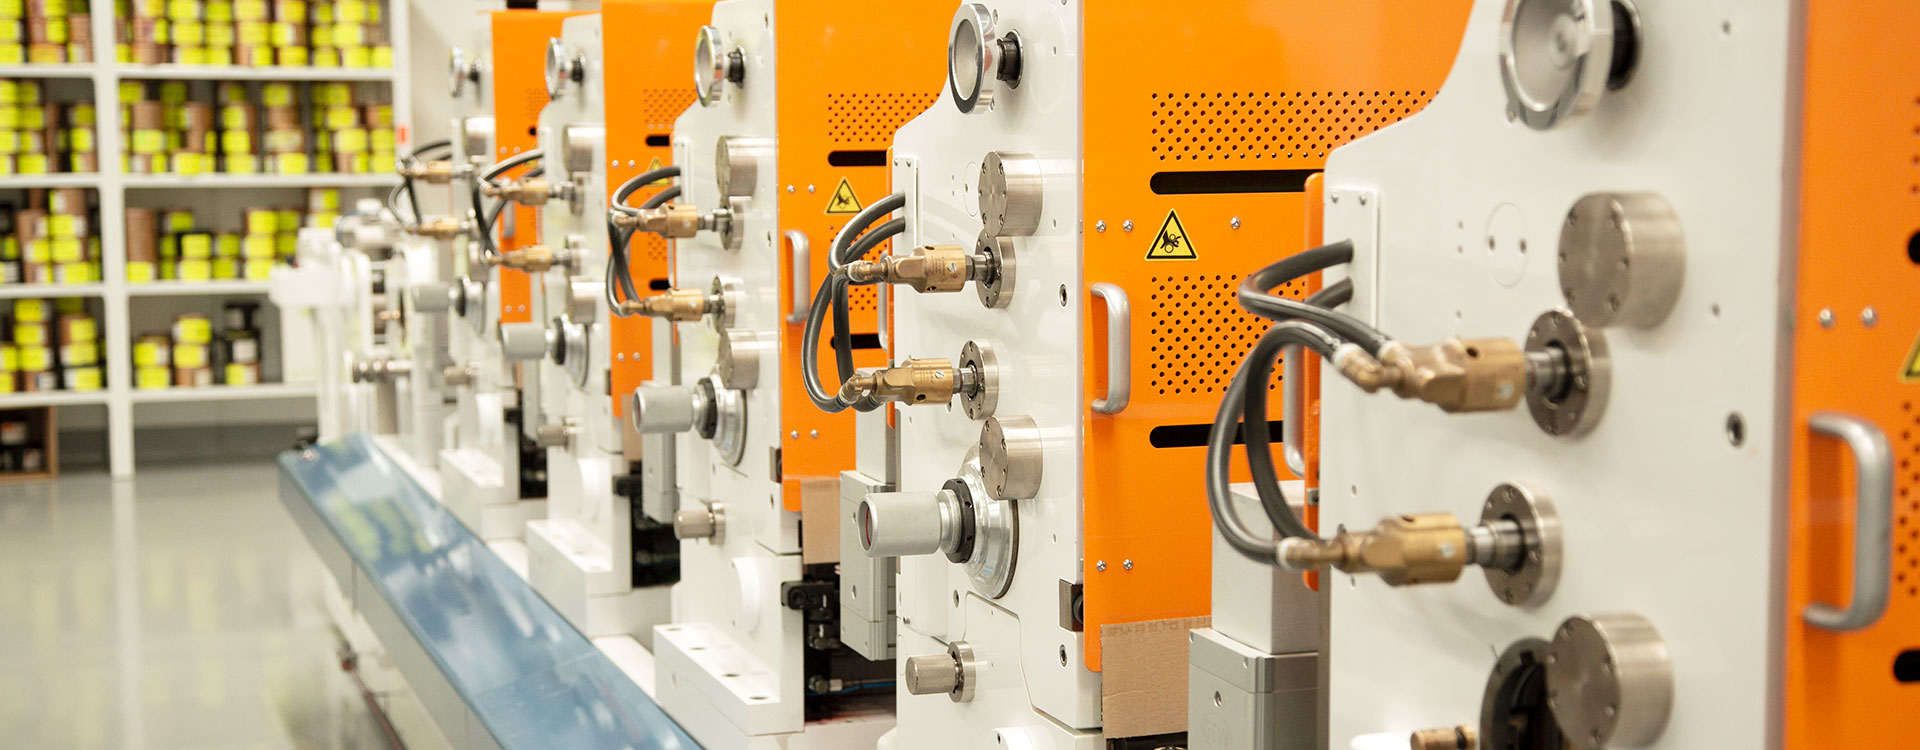 Empresa de fabricación de etiquetas autoadhesivas